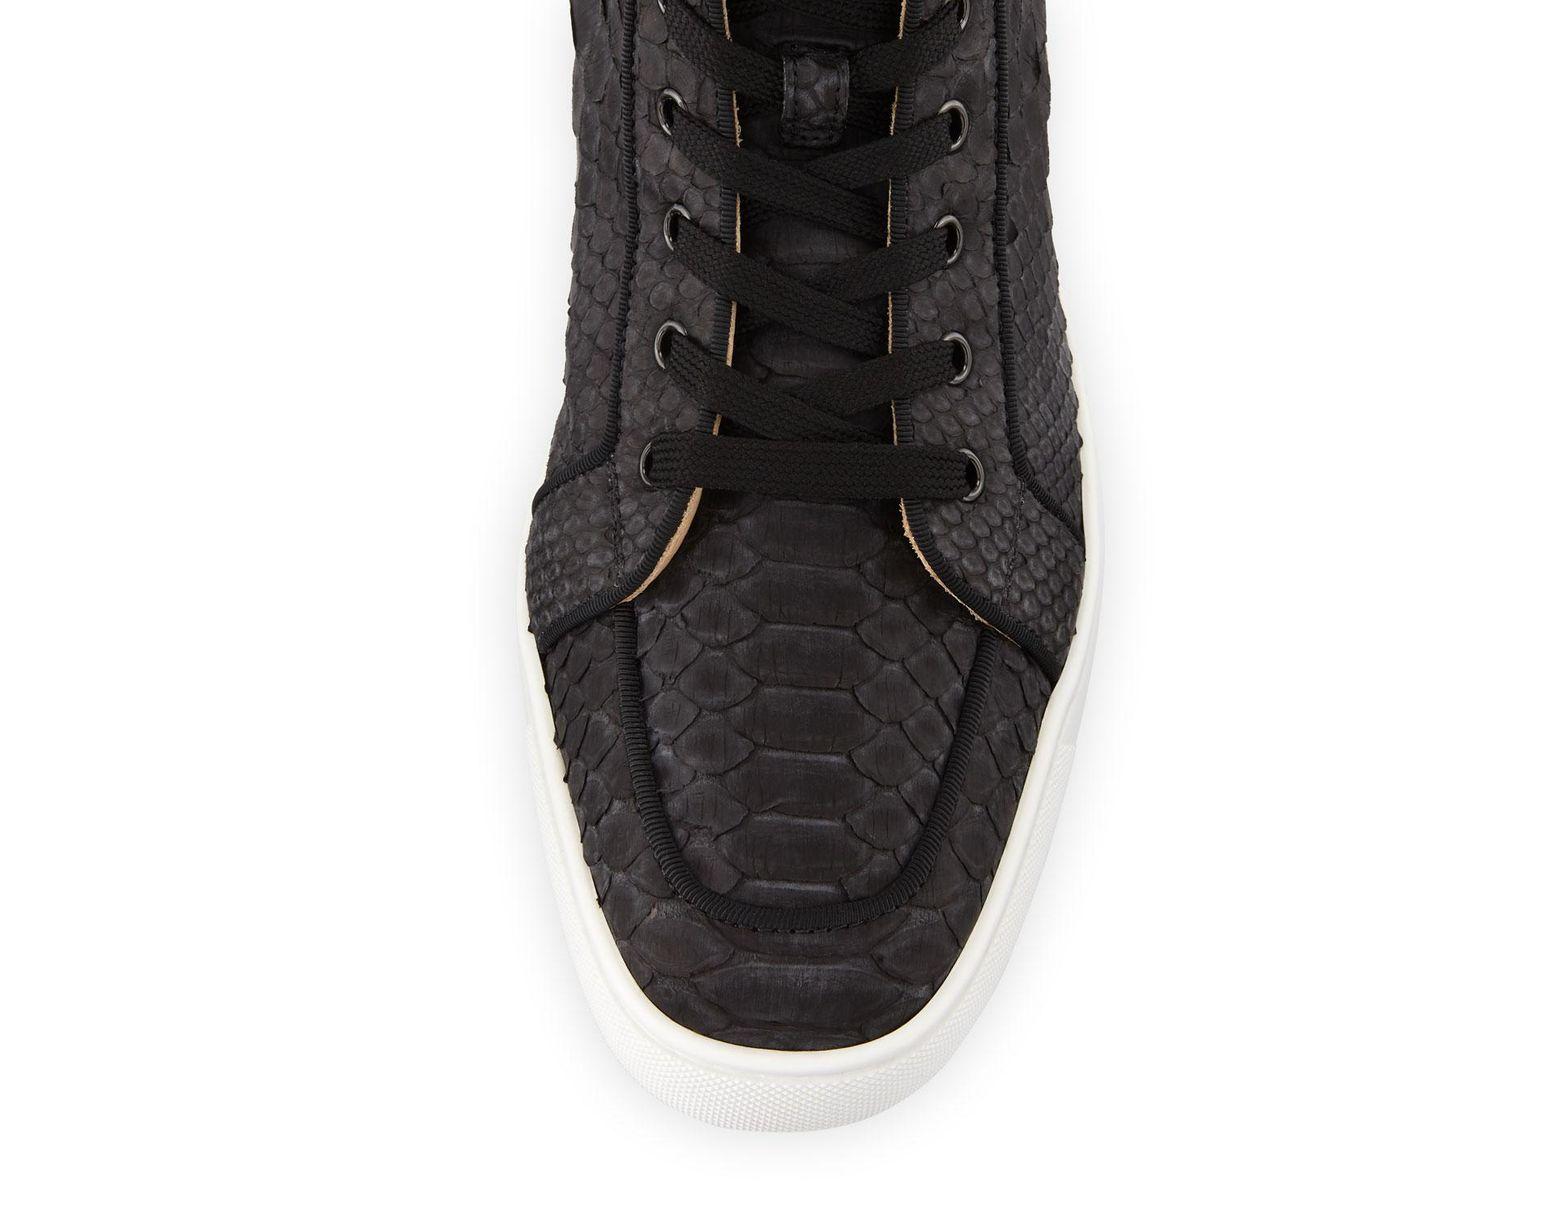 ce5e9193e944 Christian Louboutin Men's Rantus Python High-top Sneakers in Black for Men  - Lyst